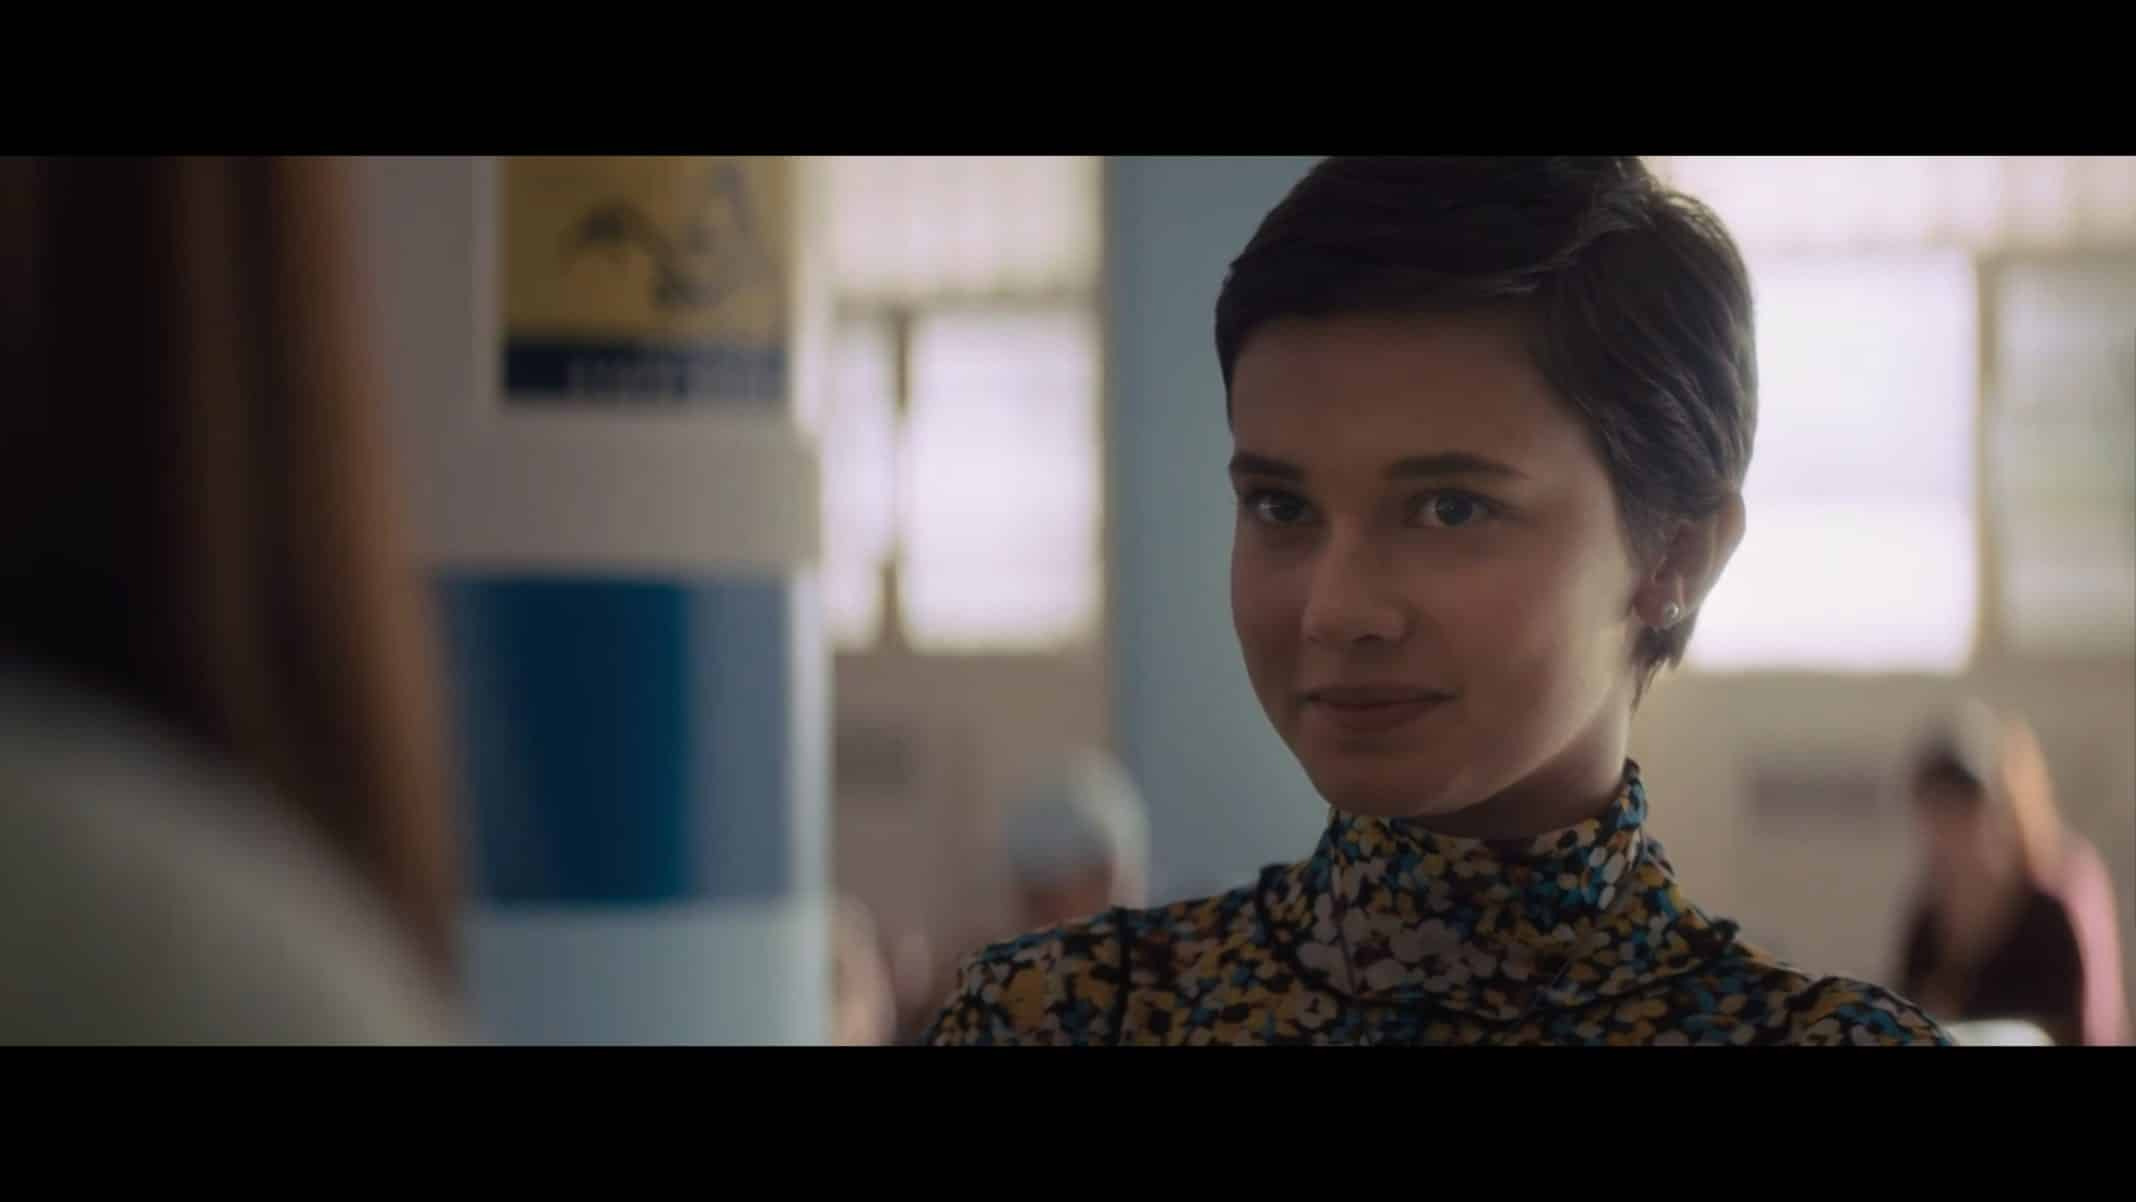 Lily (Cailee Spaeny) smirking